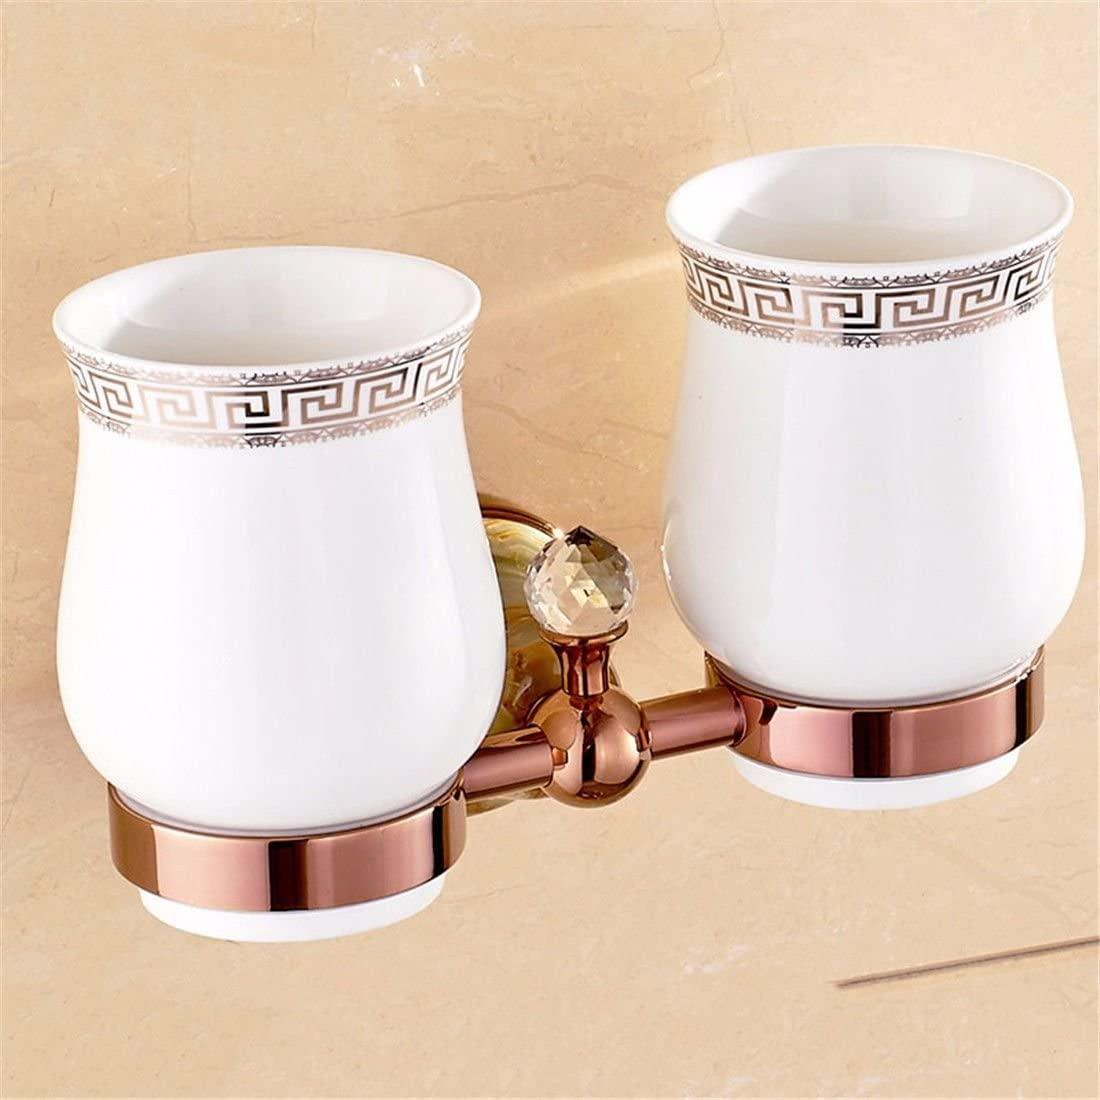 AiRobin-Brass Jade Wall Mounted Toothbrush Cup Holder Bathroom Accessory